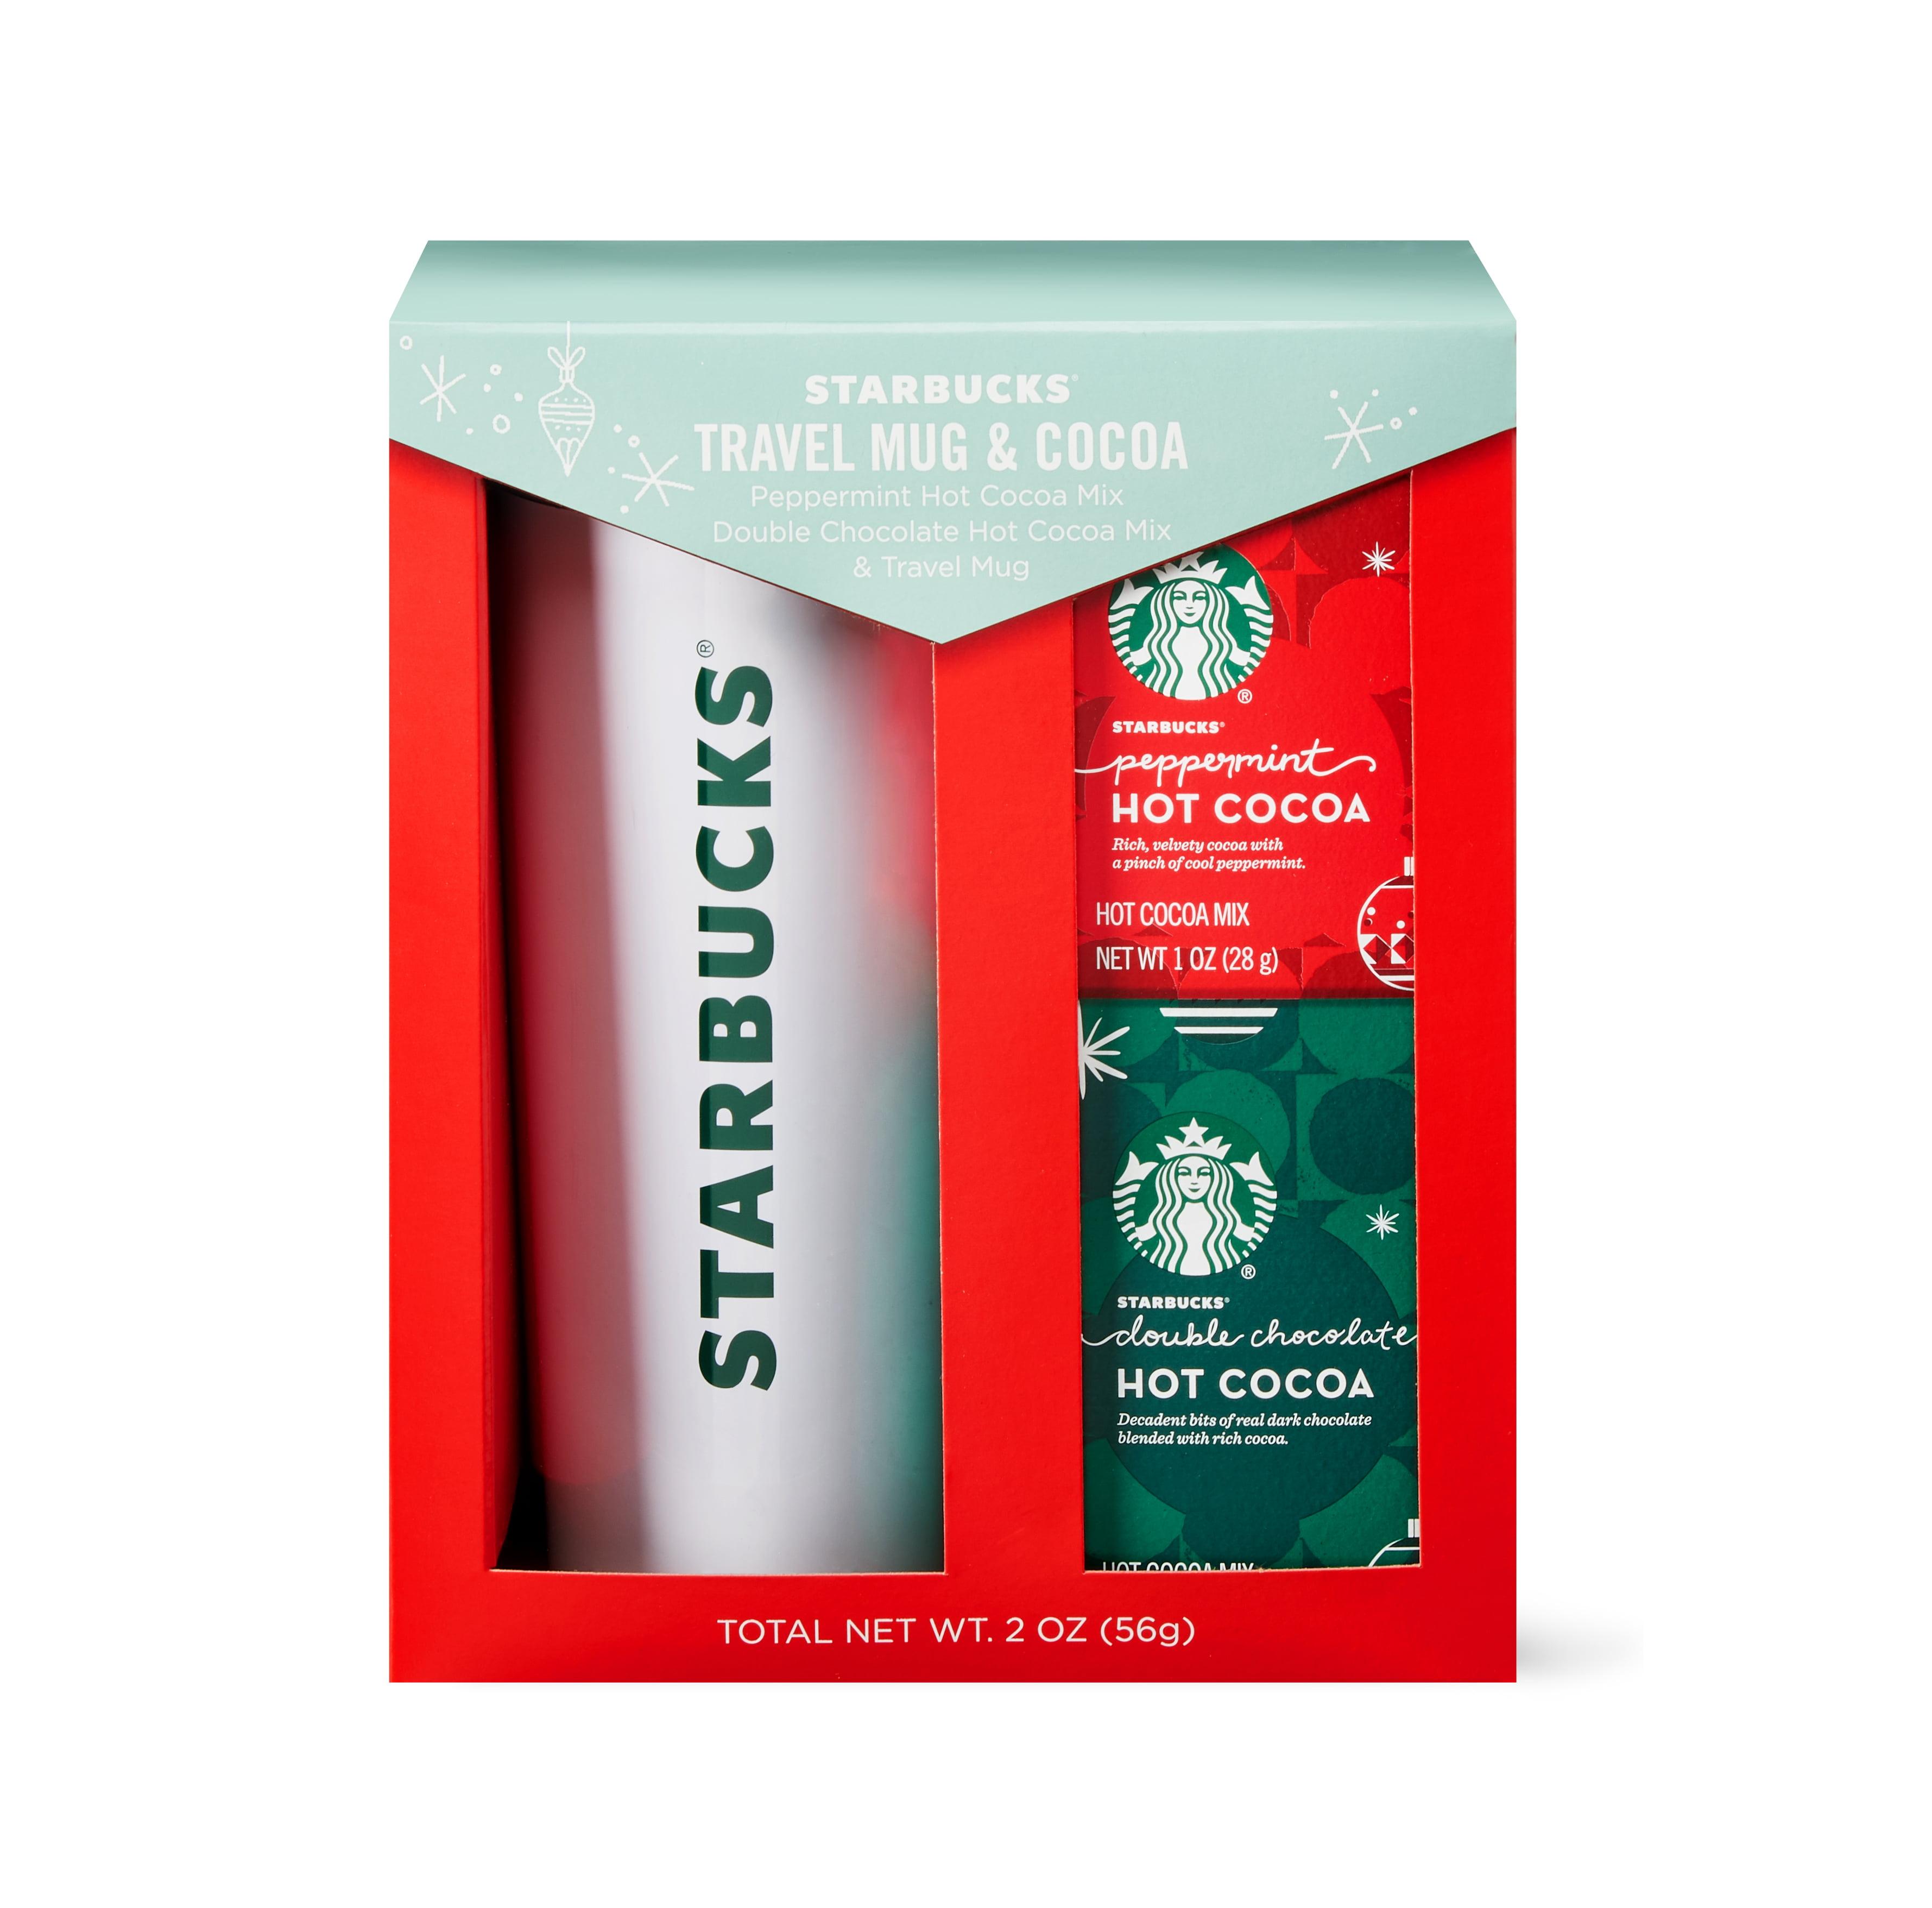 Starbucks® Cocoa & Travel Mug Holiday Gift Set 3 pc box